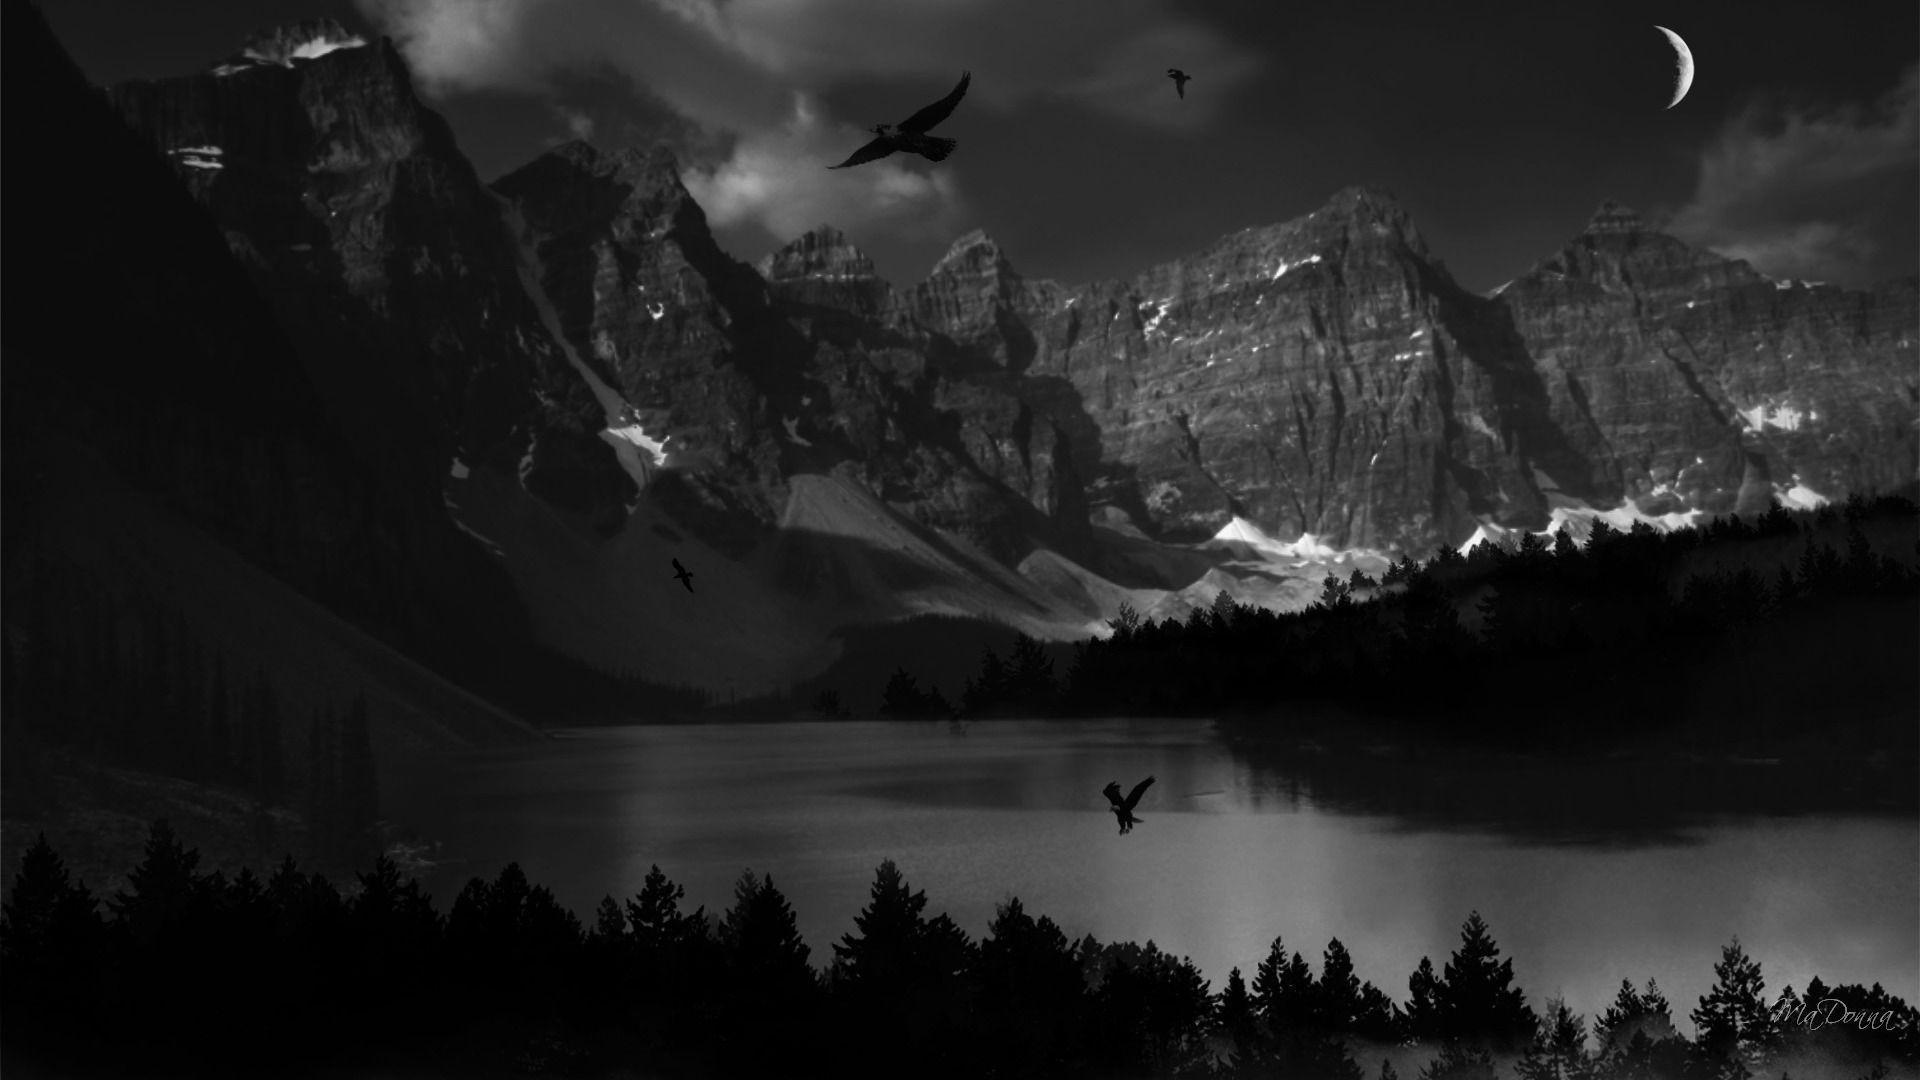 Dark HD Wallpapers - Wallpaper Cave